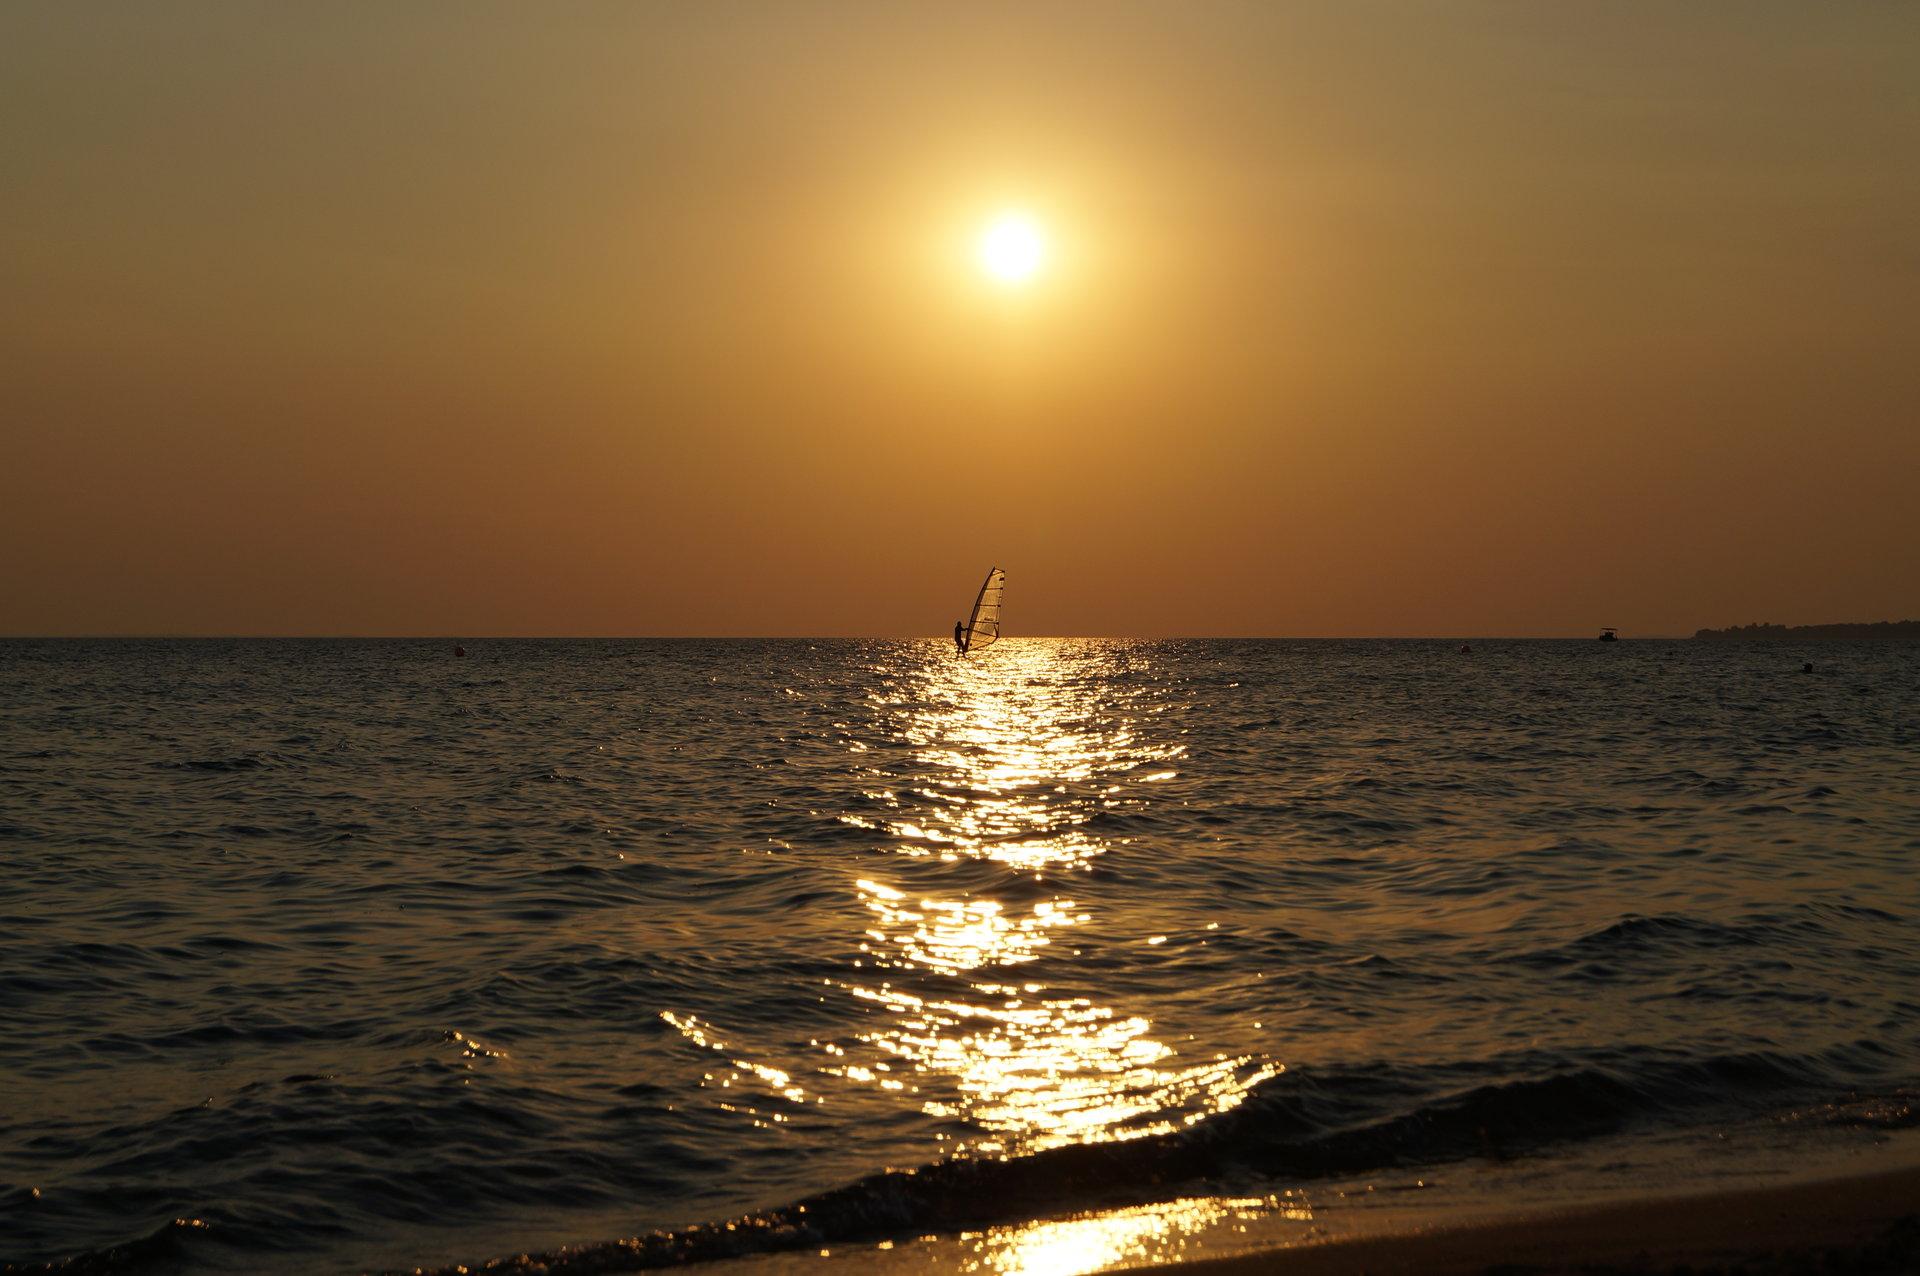 Към Слънцето | Author mirasharp | PHOTO FORUM